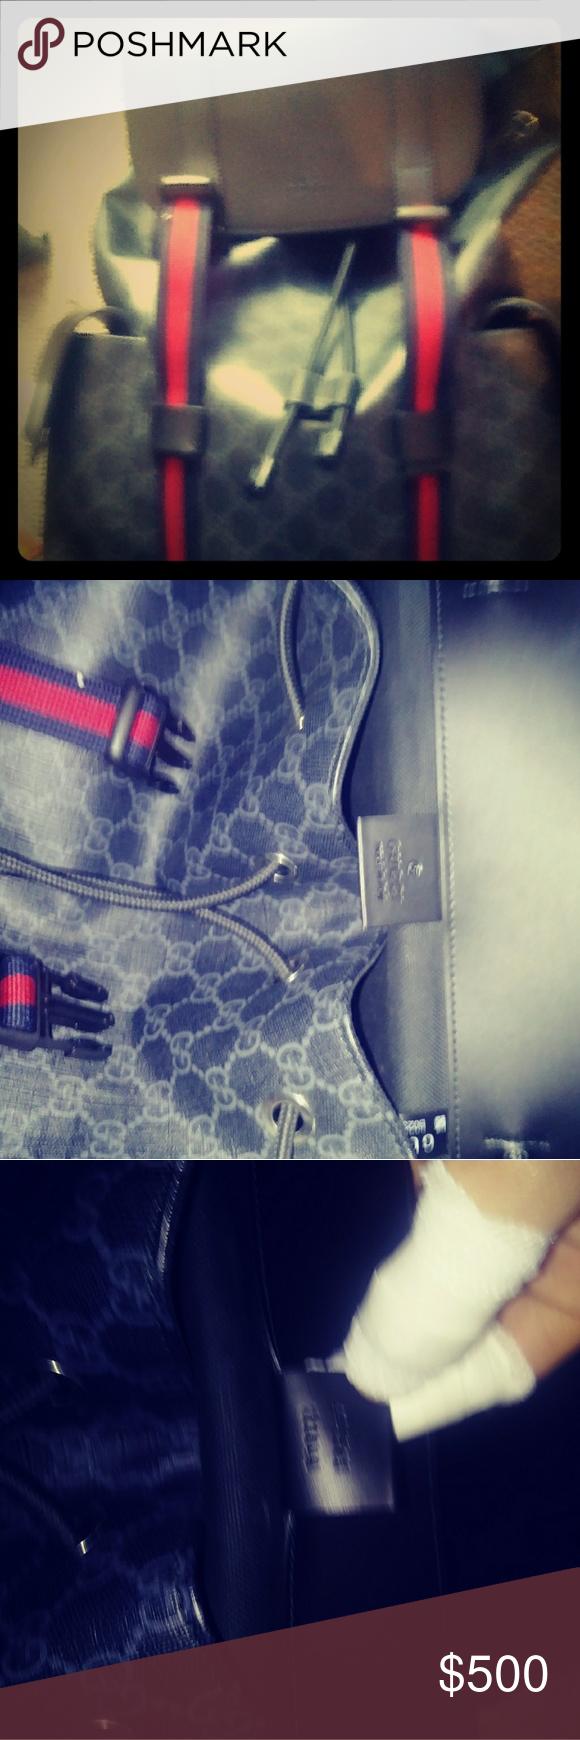 b5fb3a87b16d Soft GG Supreme backpack Style 495563 K9R8X 1071 DESCRIPTION The GG motif  in a distinct